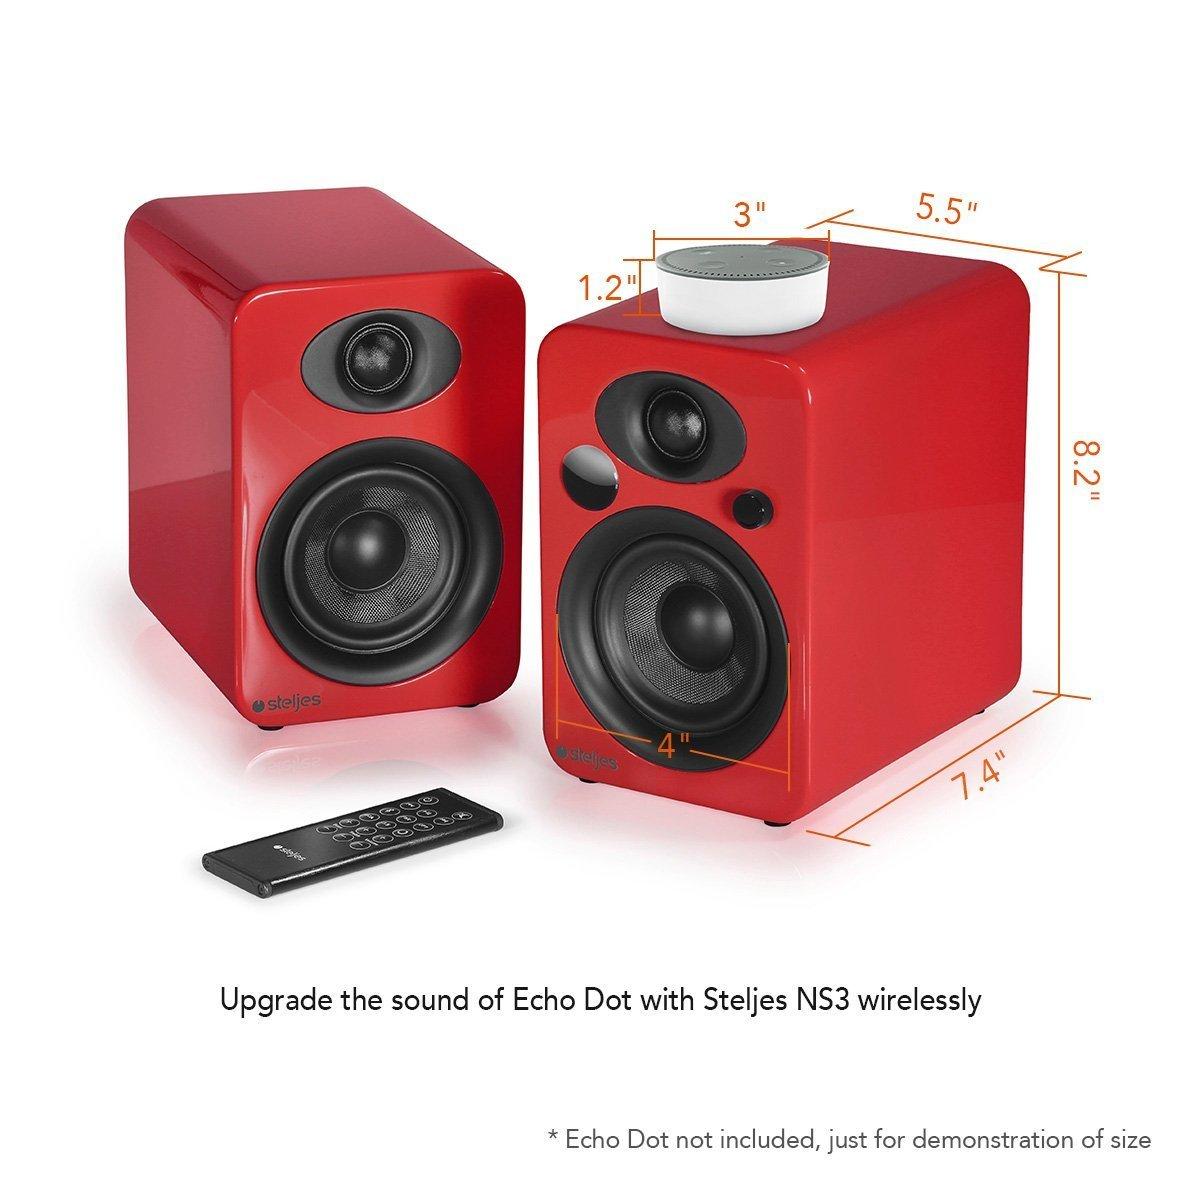 Steljes NS3 Altavoz Estéreo Inalambrica Bluetooth, Sistema de Altavoces Subwoofer Portátil, para Hogar o Aire Libre, Color Rojo Bermellón: Amazon.es: ...